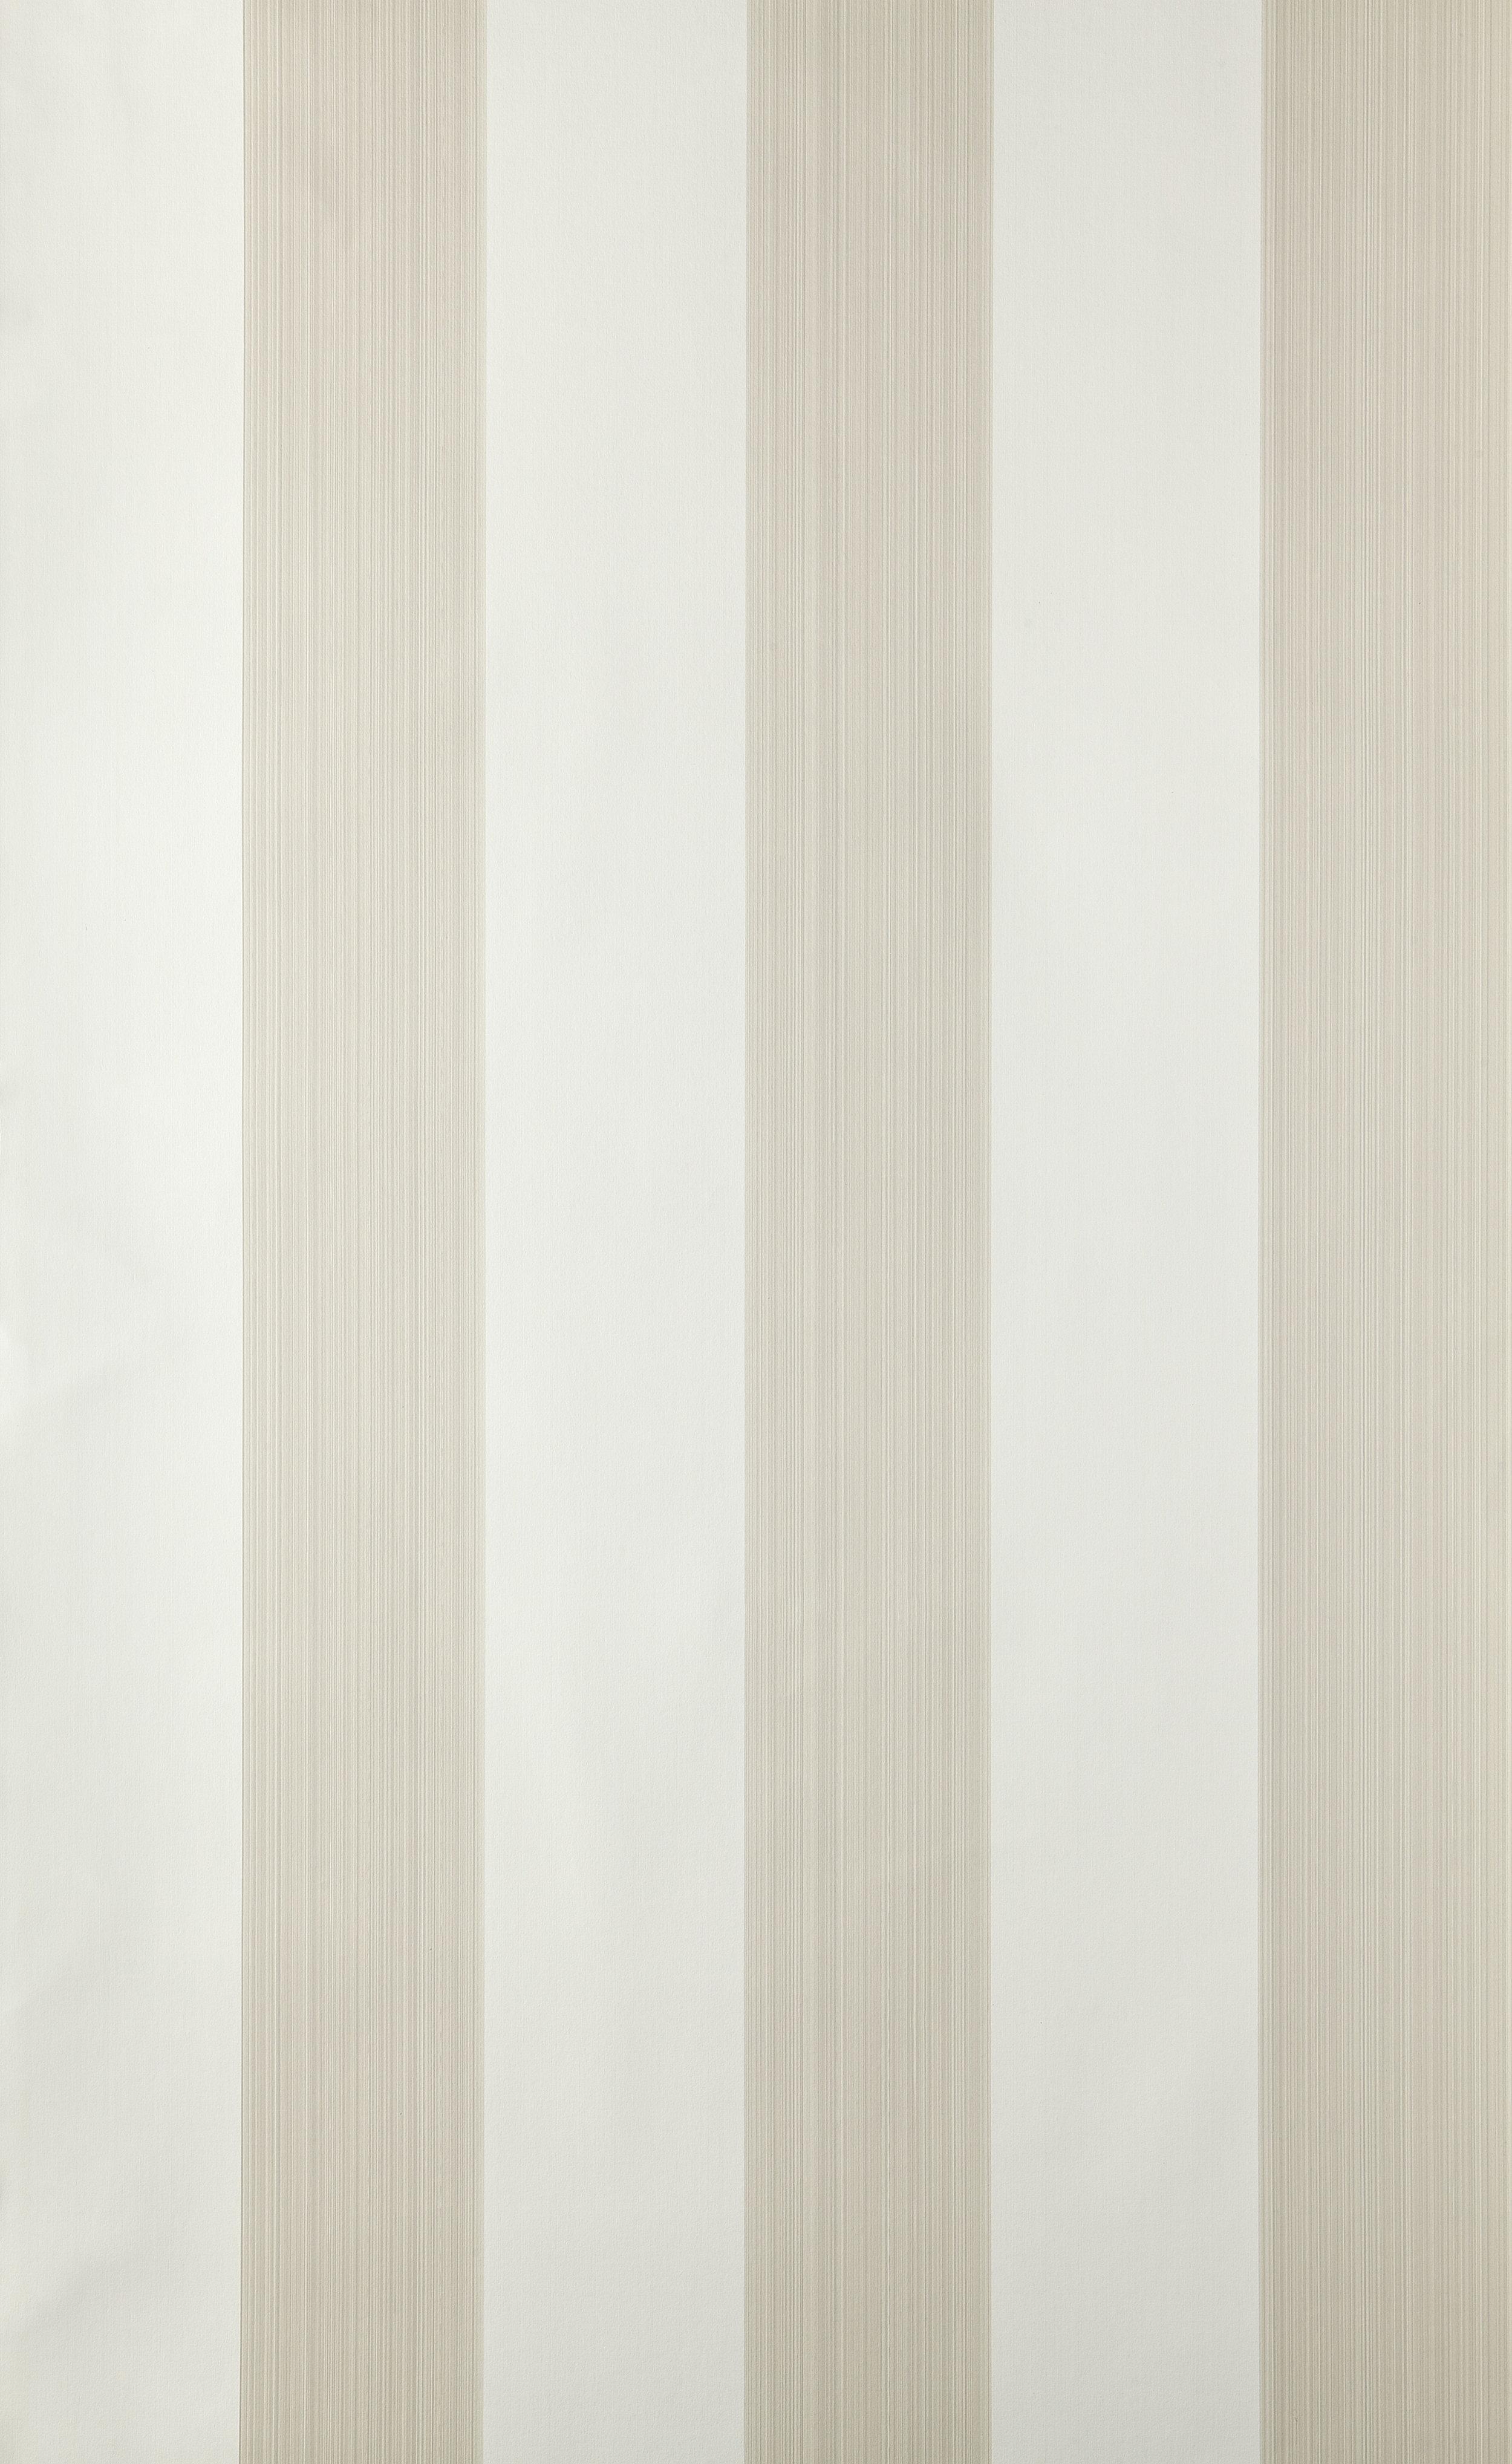 Plain Stripe 1173 $195 Per Roll  Order Now